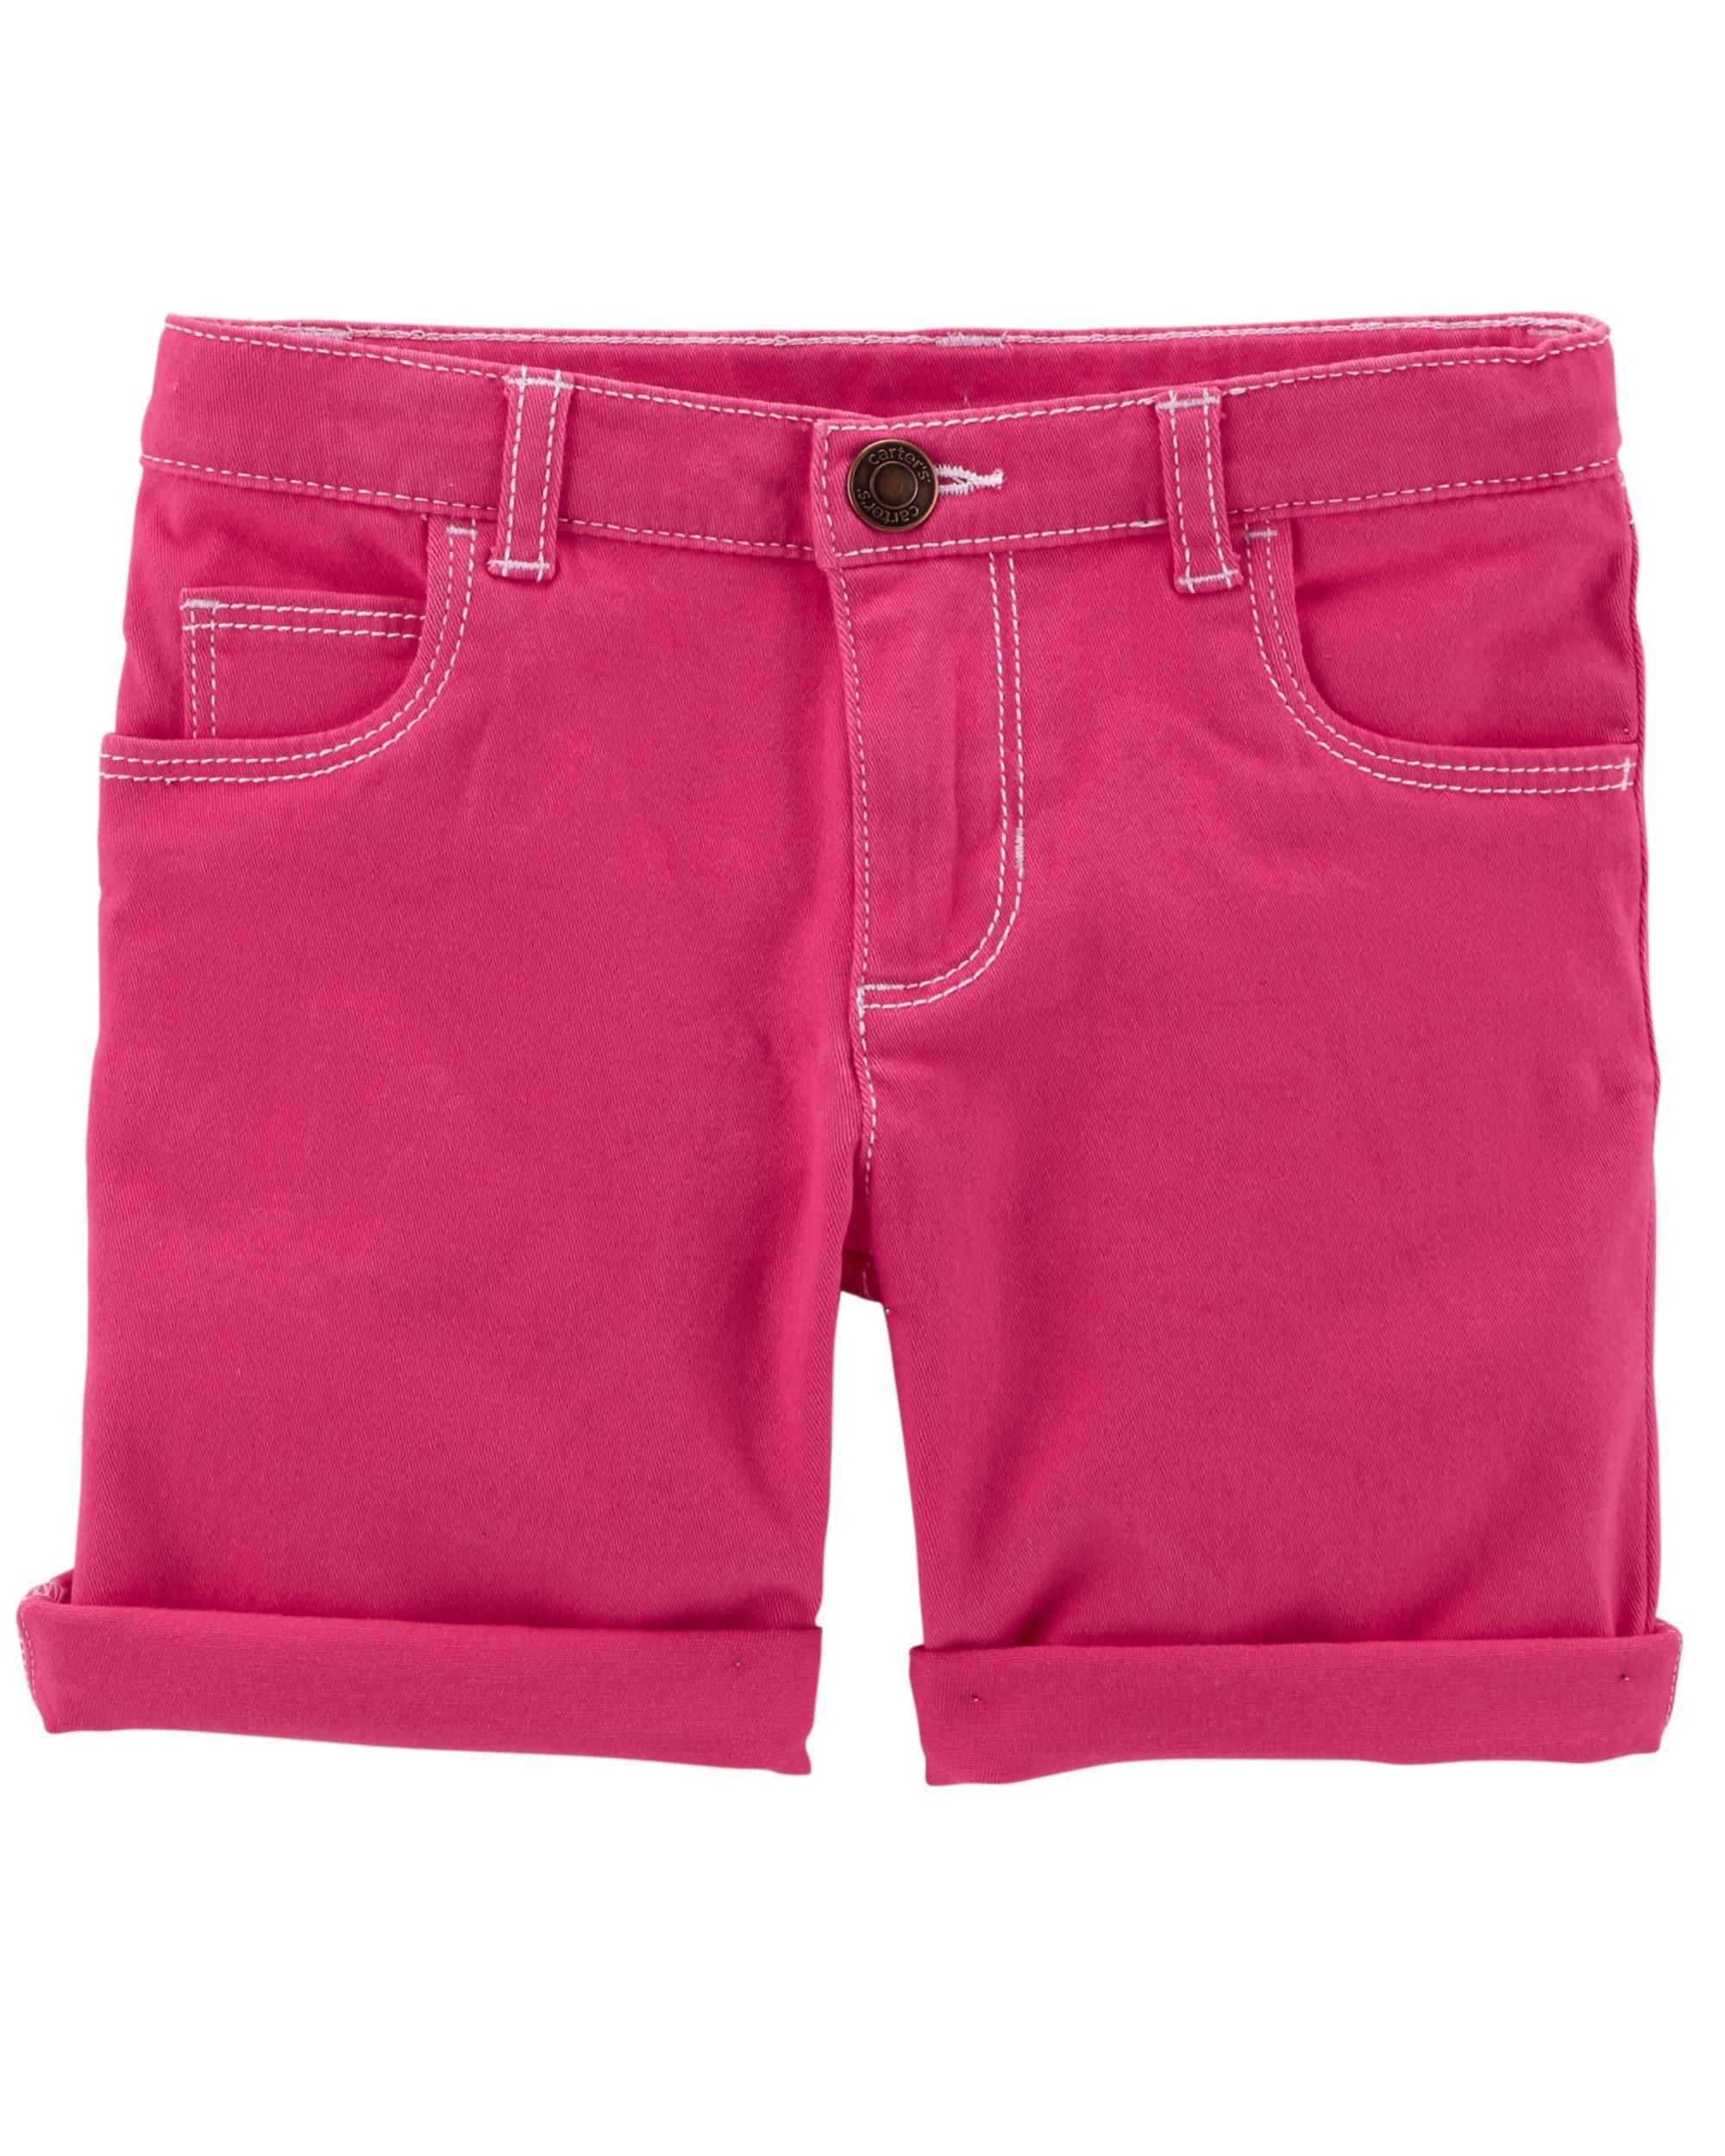 Carter's Girls' Stretch Skimmer Shorts (2T, Pink)